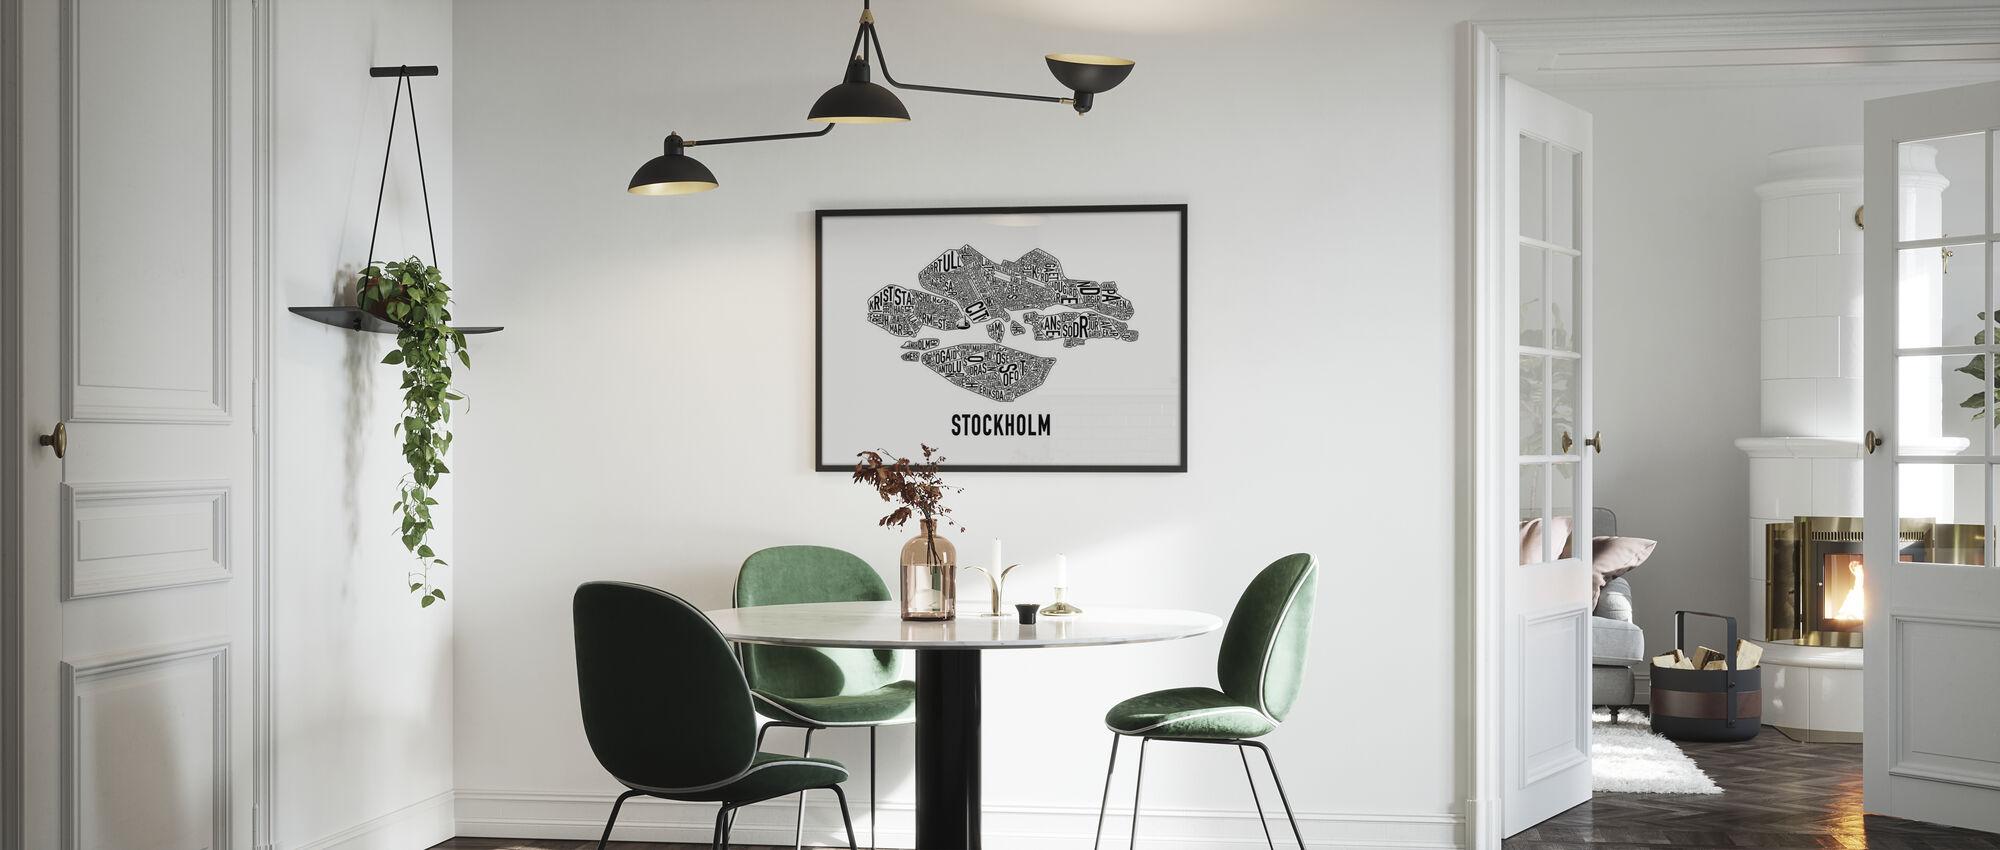 Stockholm - Poster - Küchen